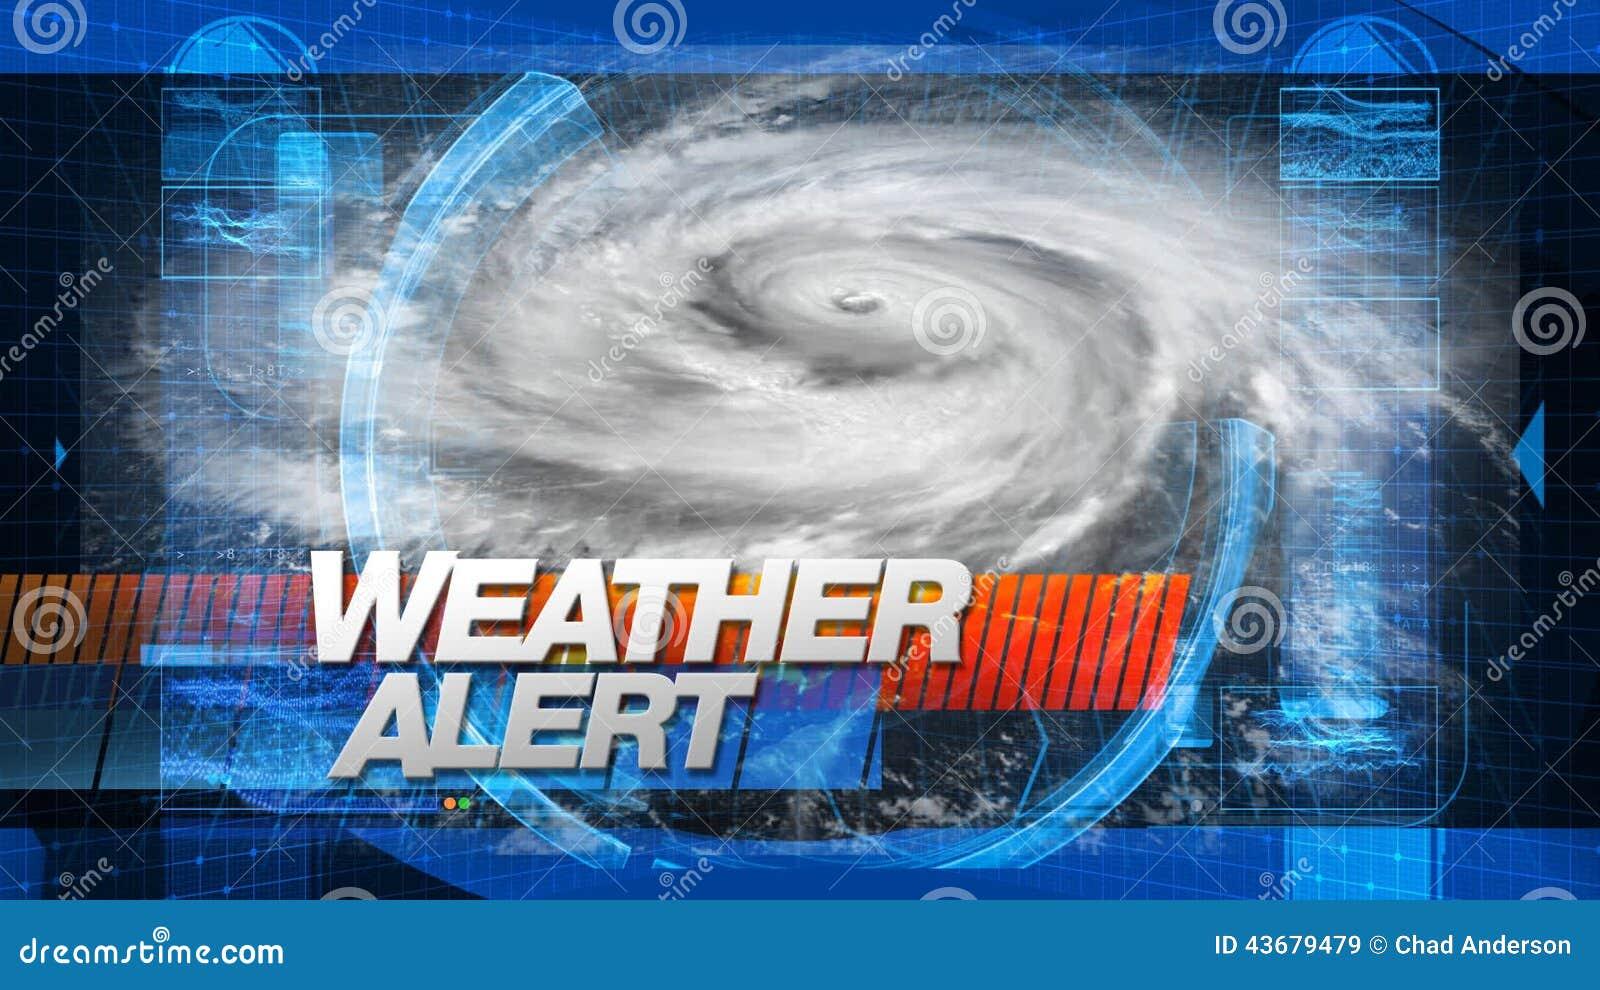 Weather Alert - Broadcast Graphics Title